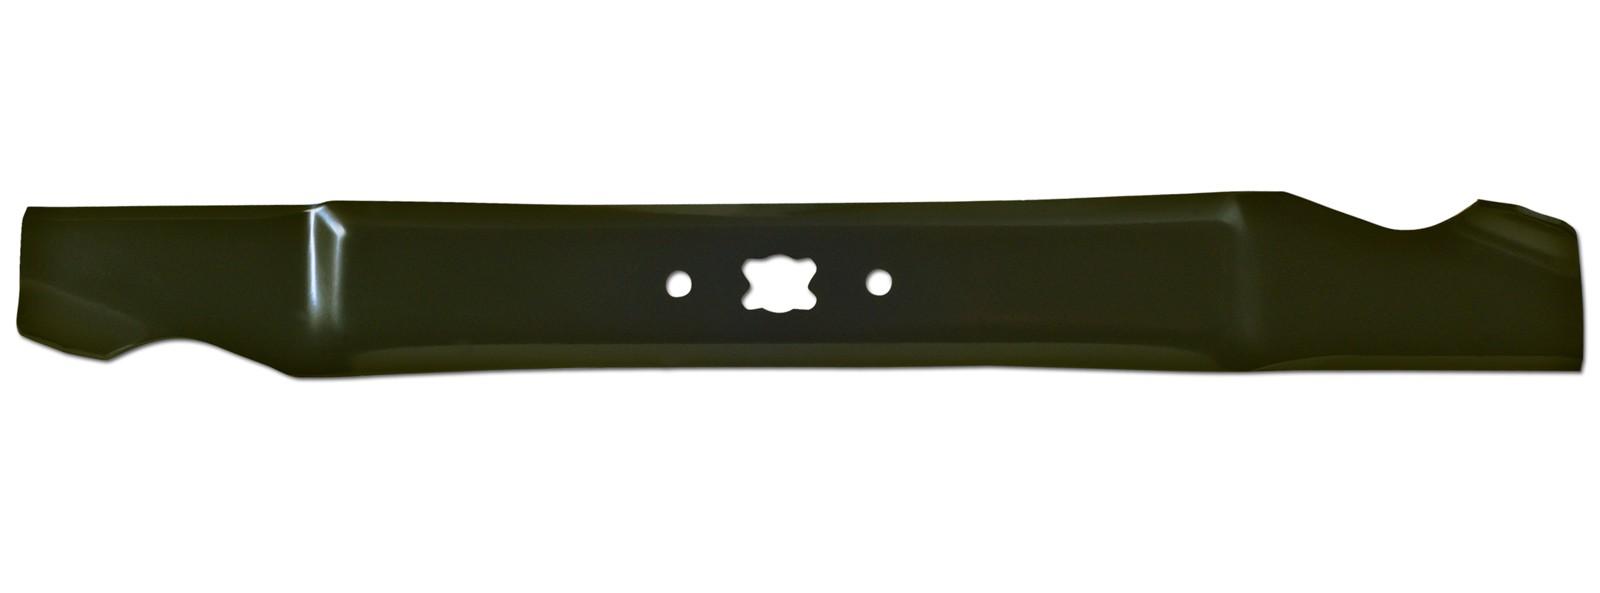 MTD Ersatzmesser für Rasenmäher MTD SB 51cm Bild 1